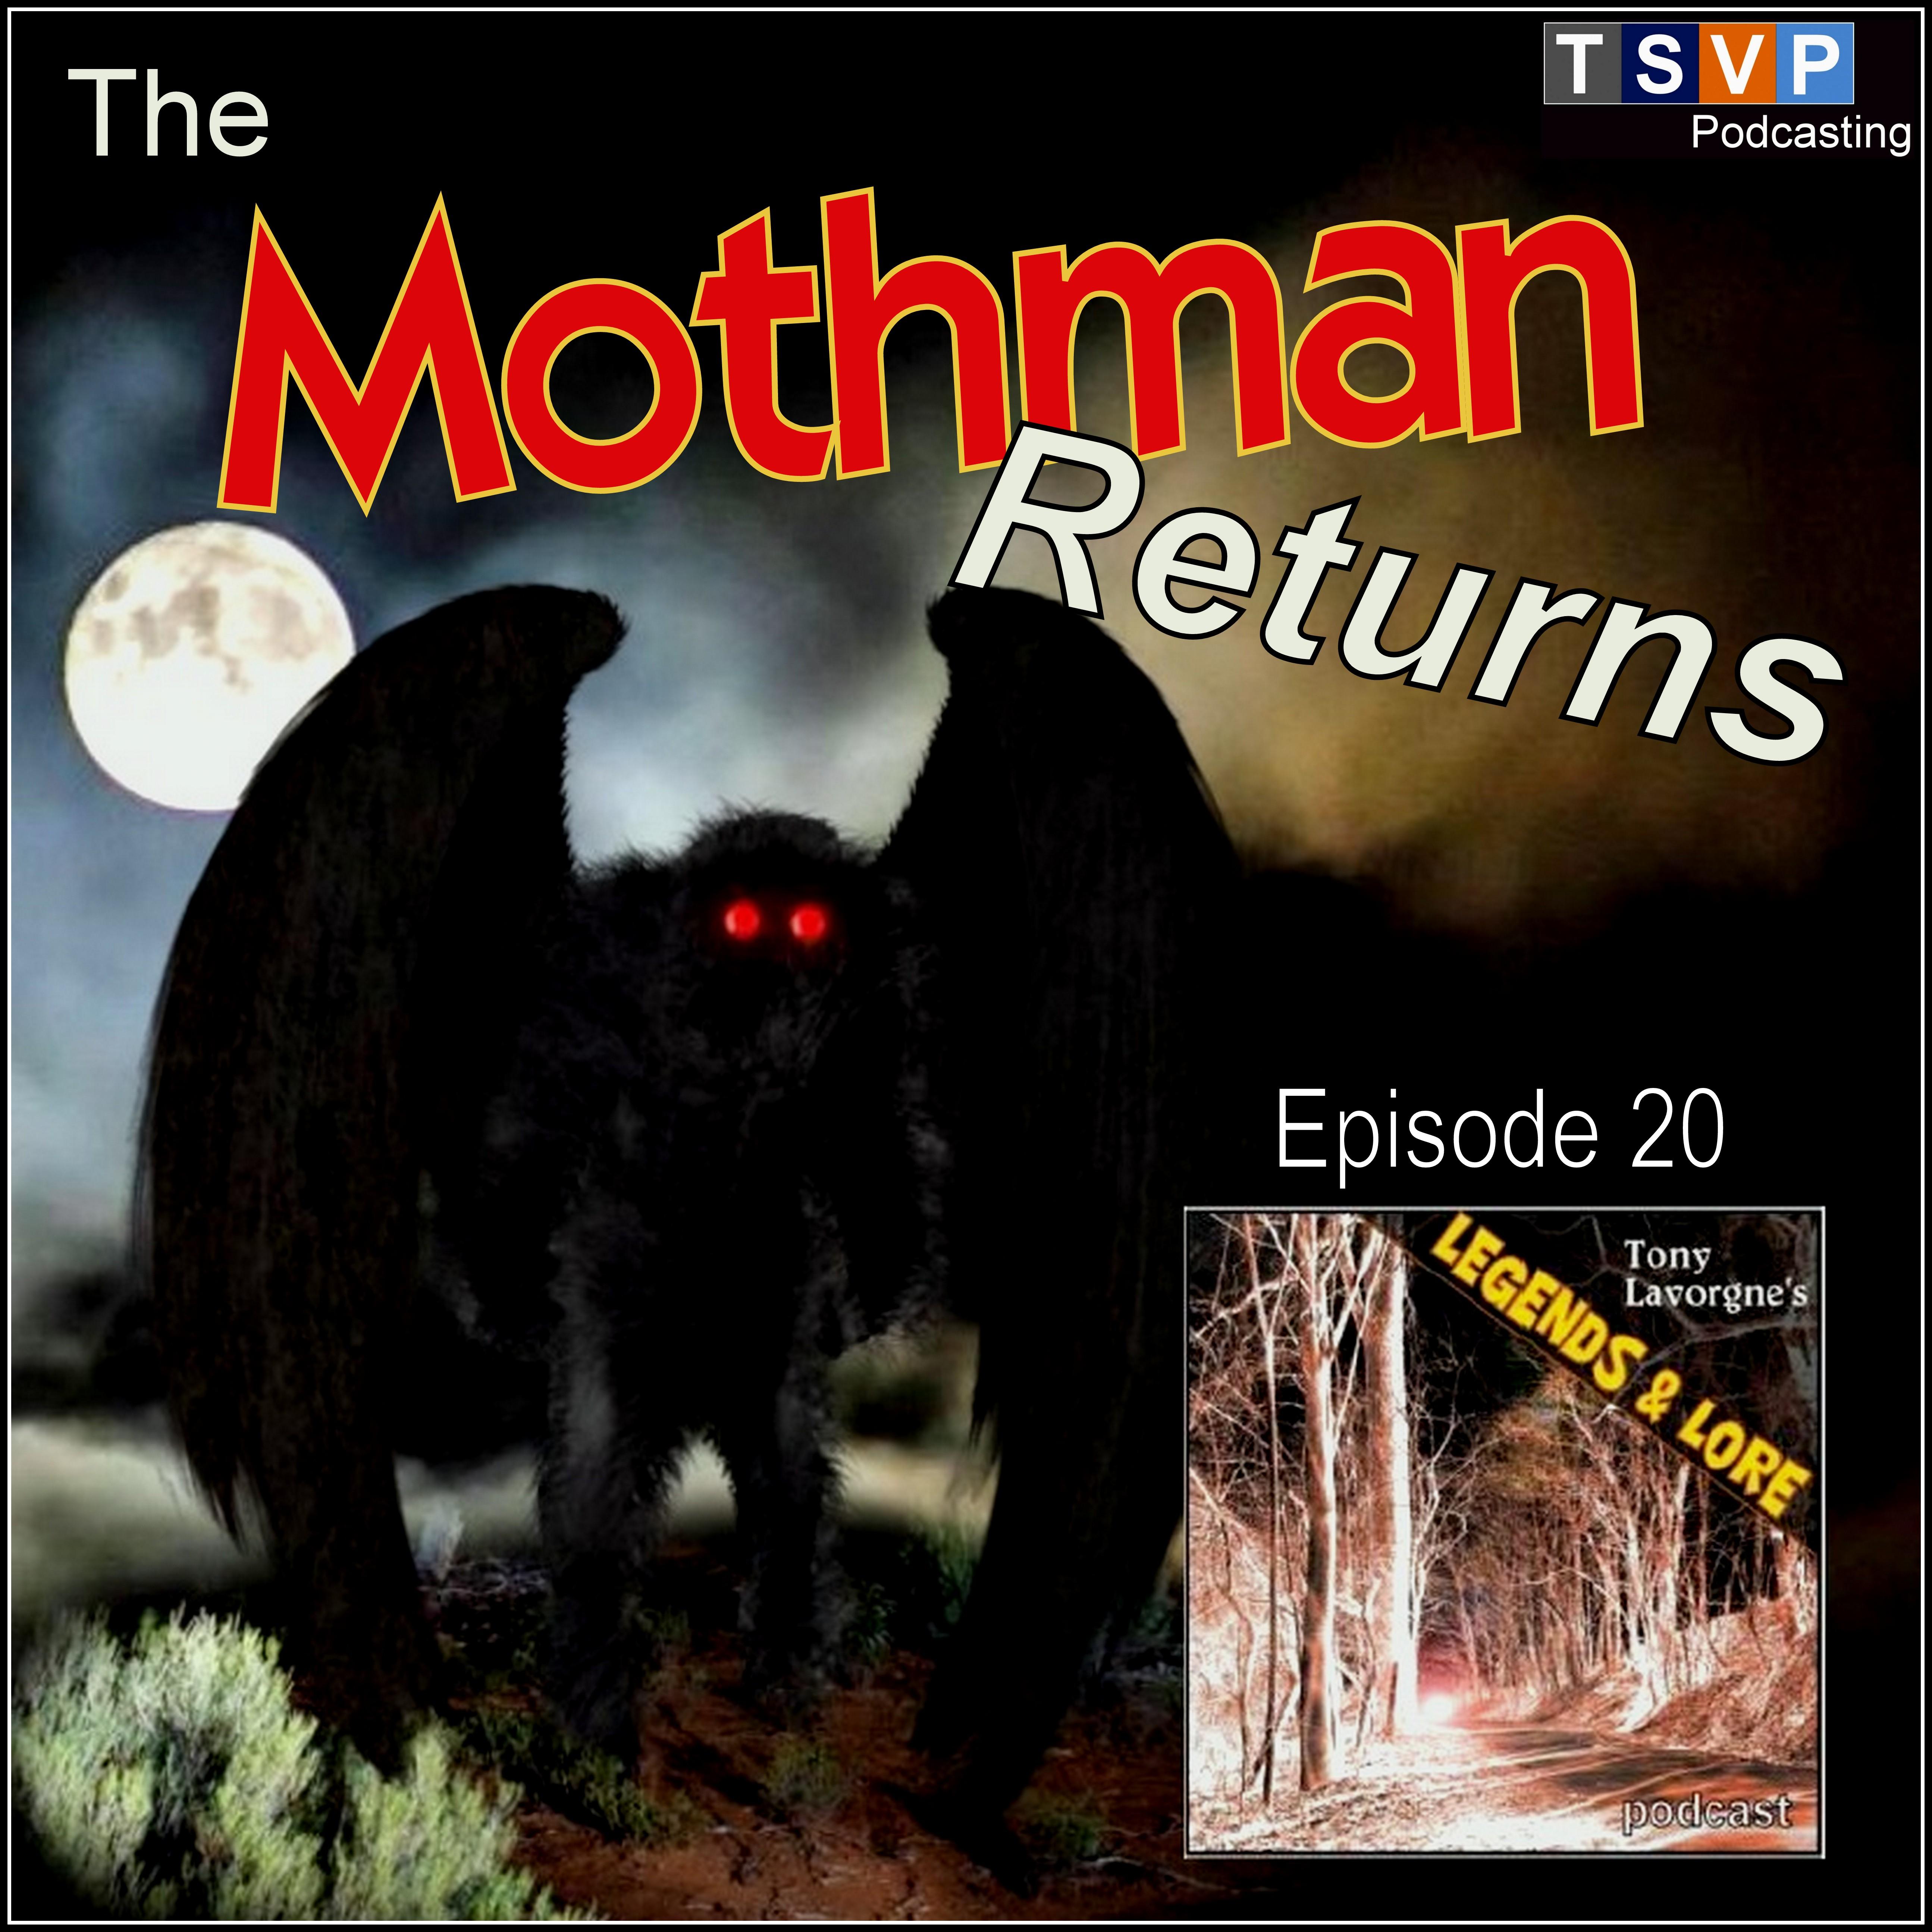 Tony Lavorgne's Legends & Lore Podcast (Ep20): The Mothman Returns